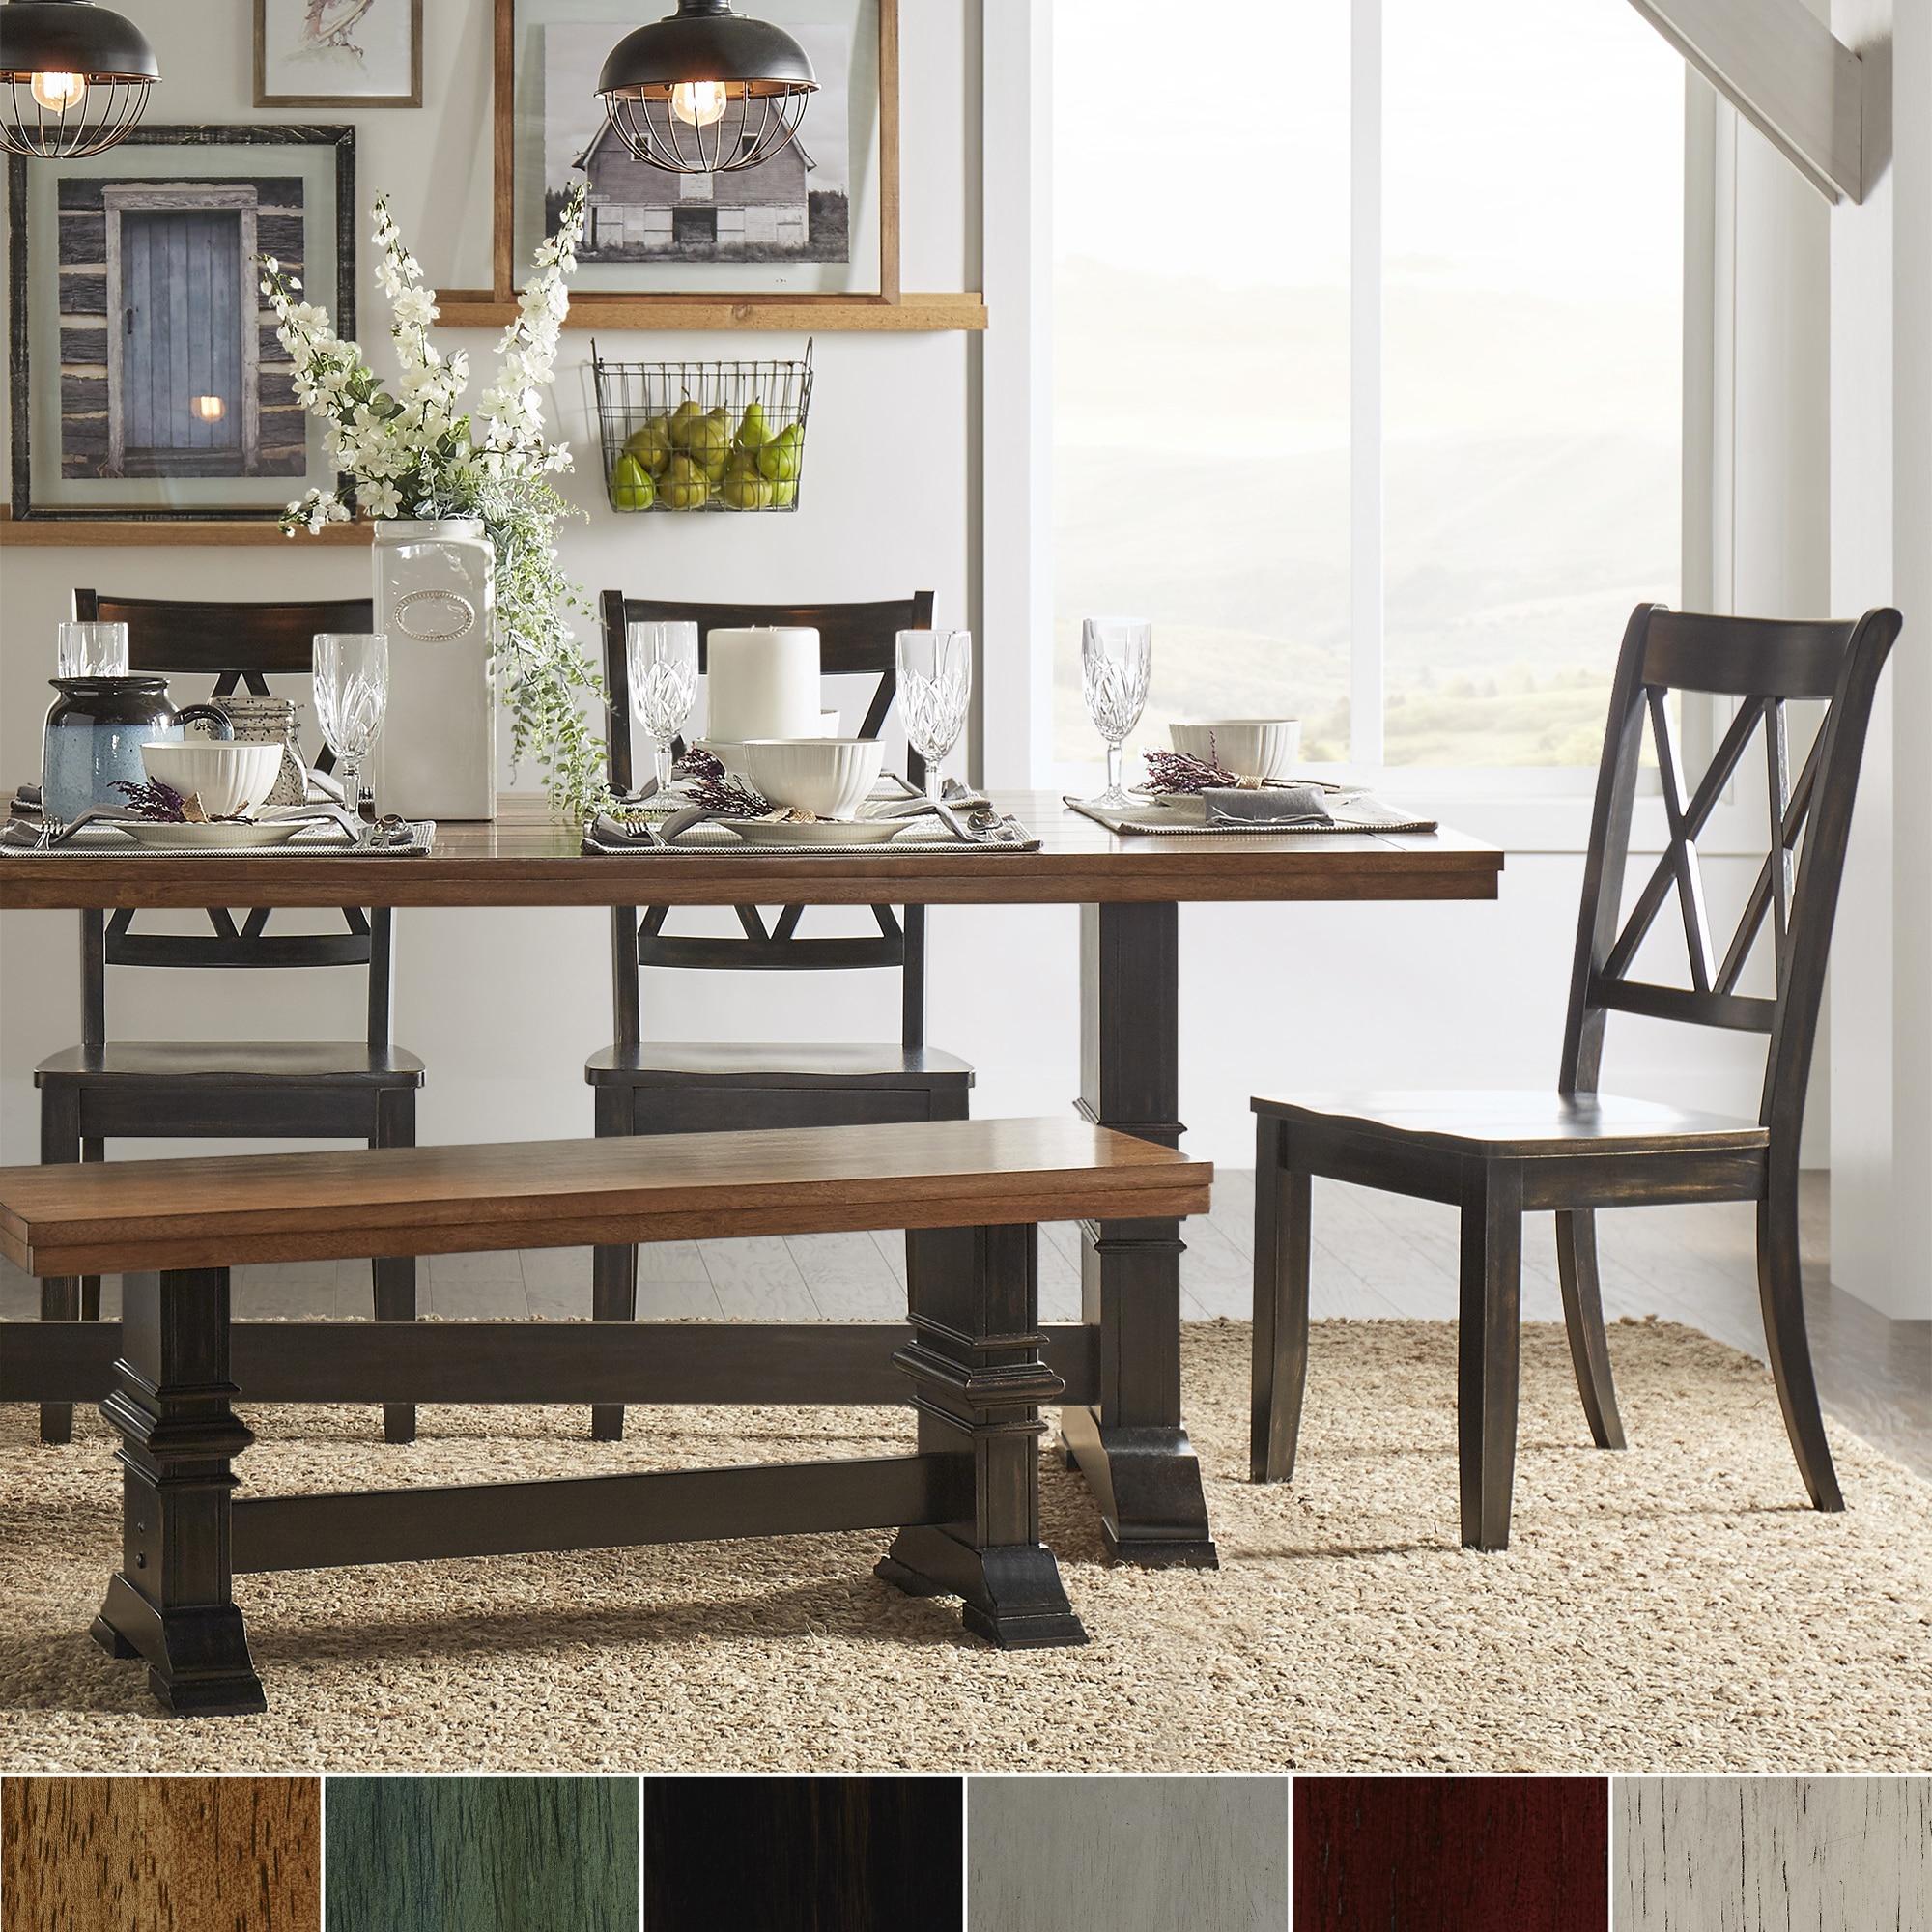 Surprising Buy 6 Piece Sets Kitchen Dining Room Sets Online At Creativecarmelina Interior Chair Design Creativecarmelinacom